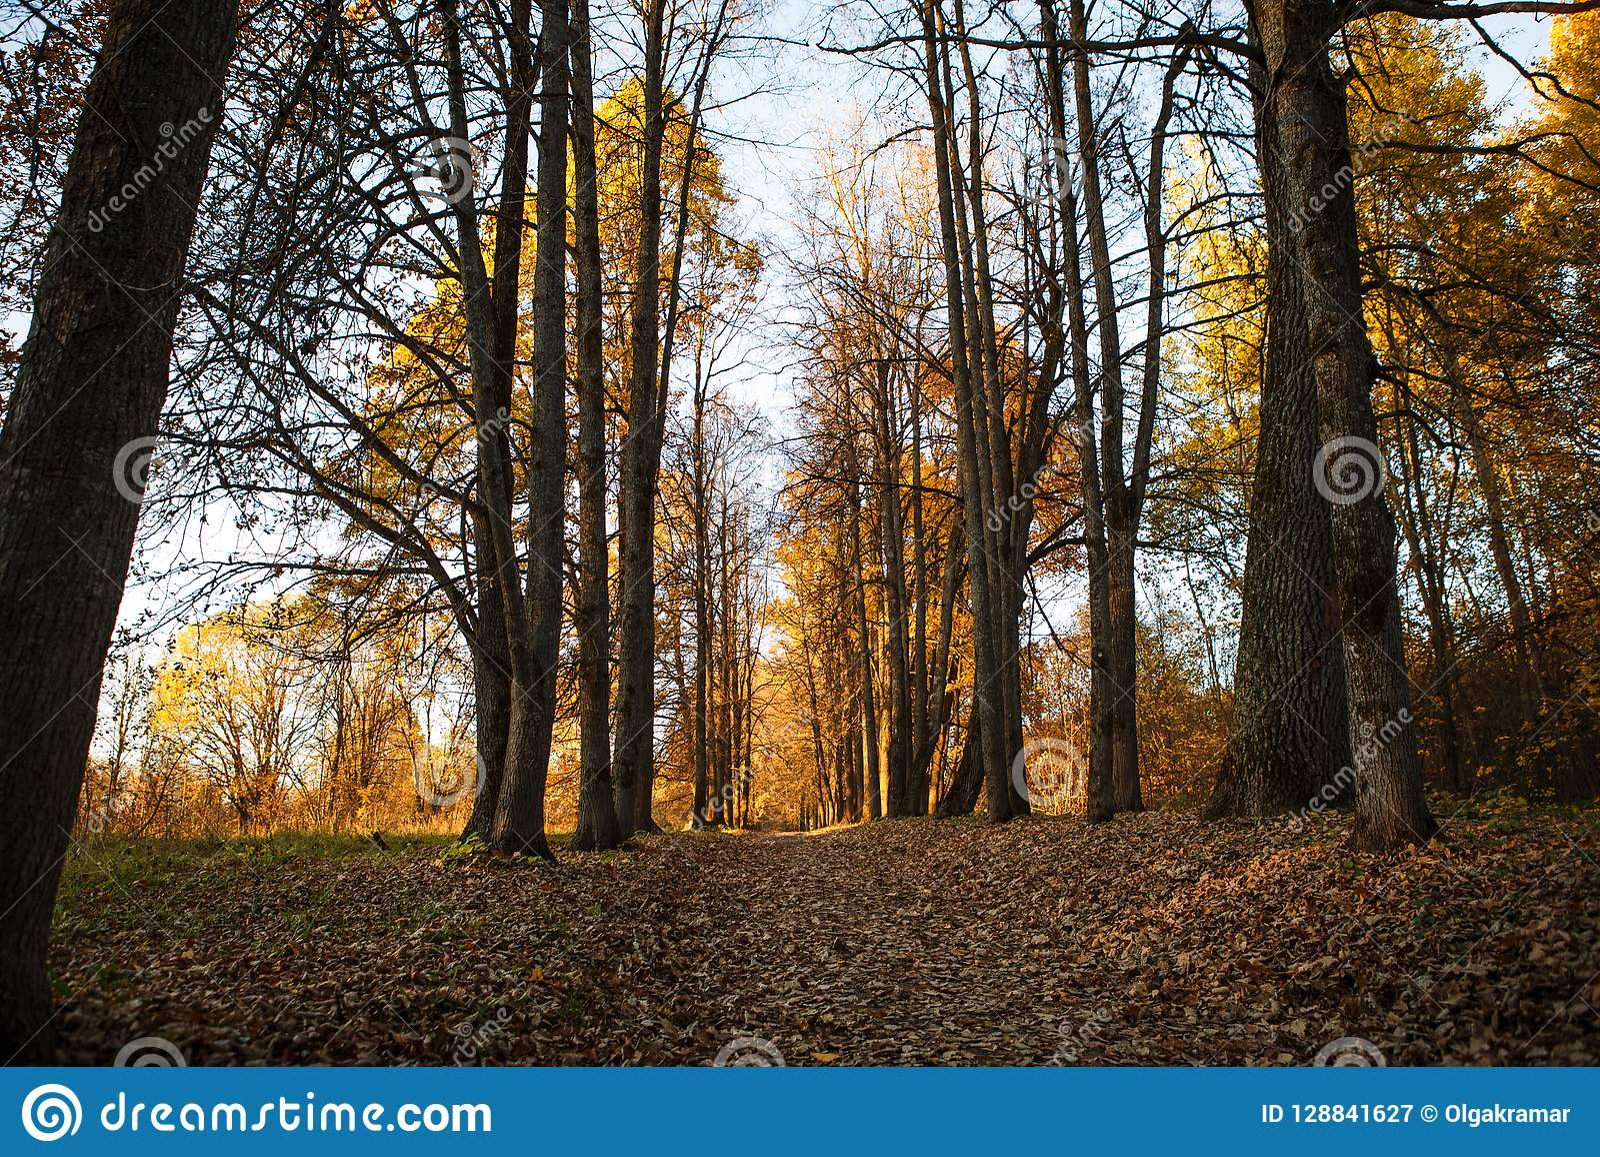 De gouden herfst, gele bomen in zonlicht, underfoot bladeren